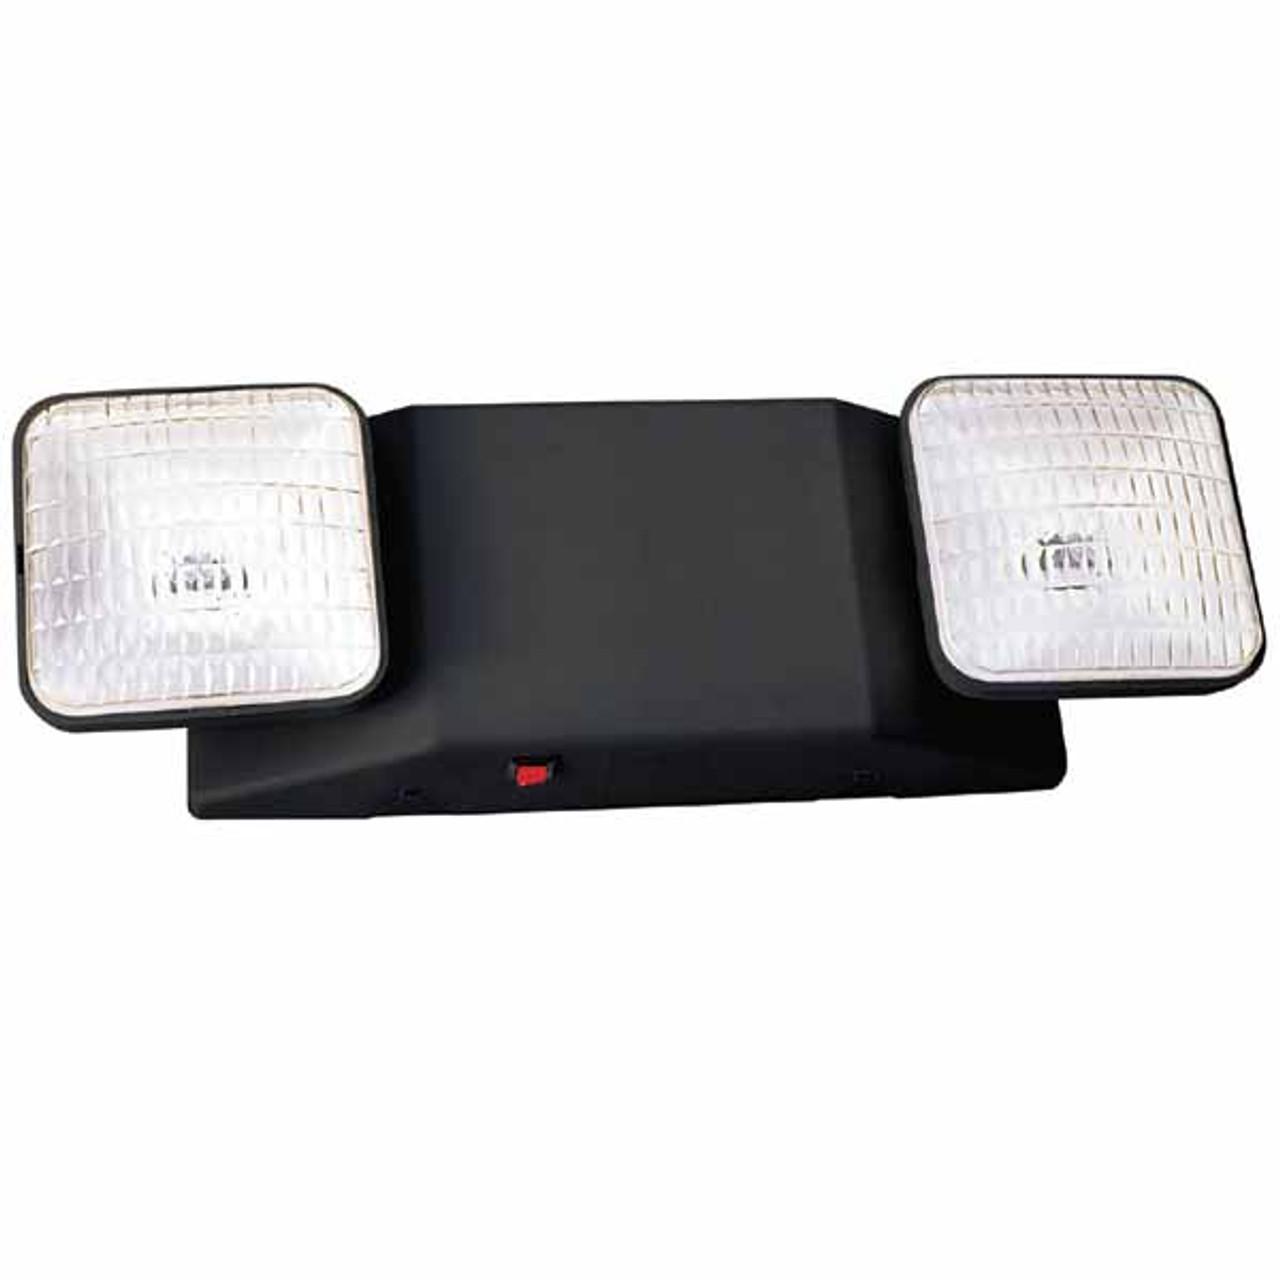 2 Head Adjustable Black Emergency Light with Battery Backup